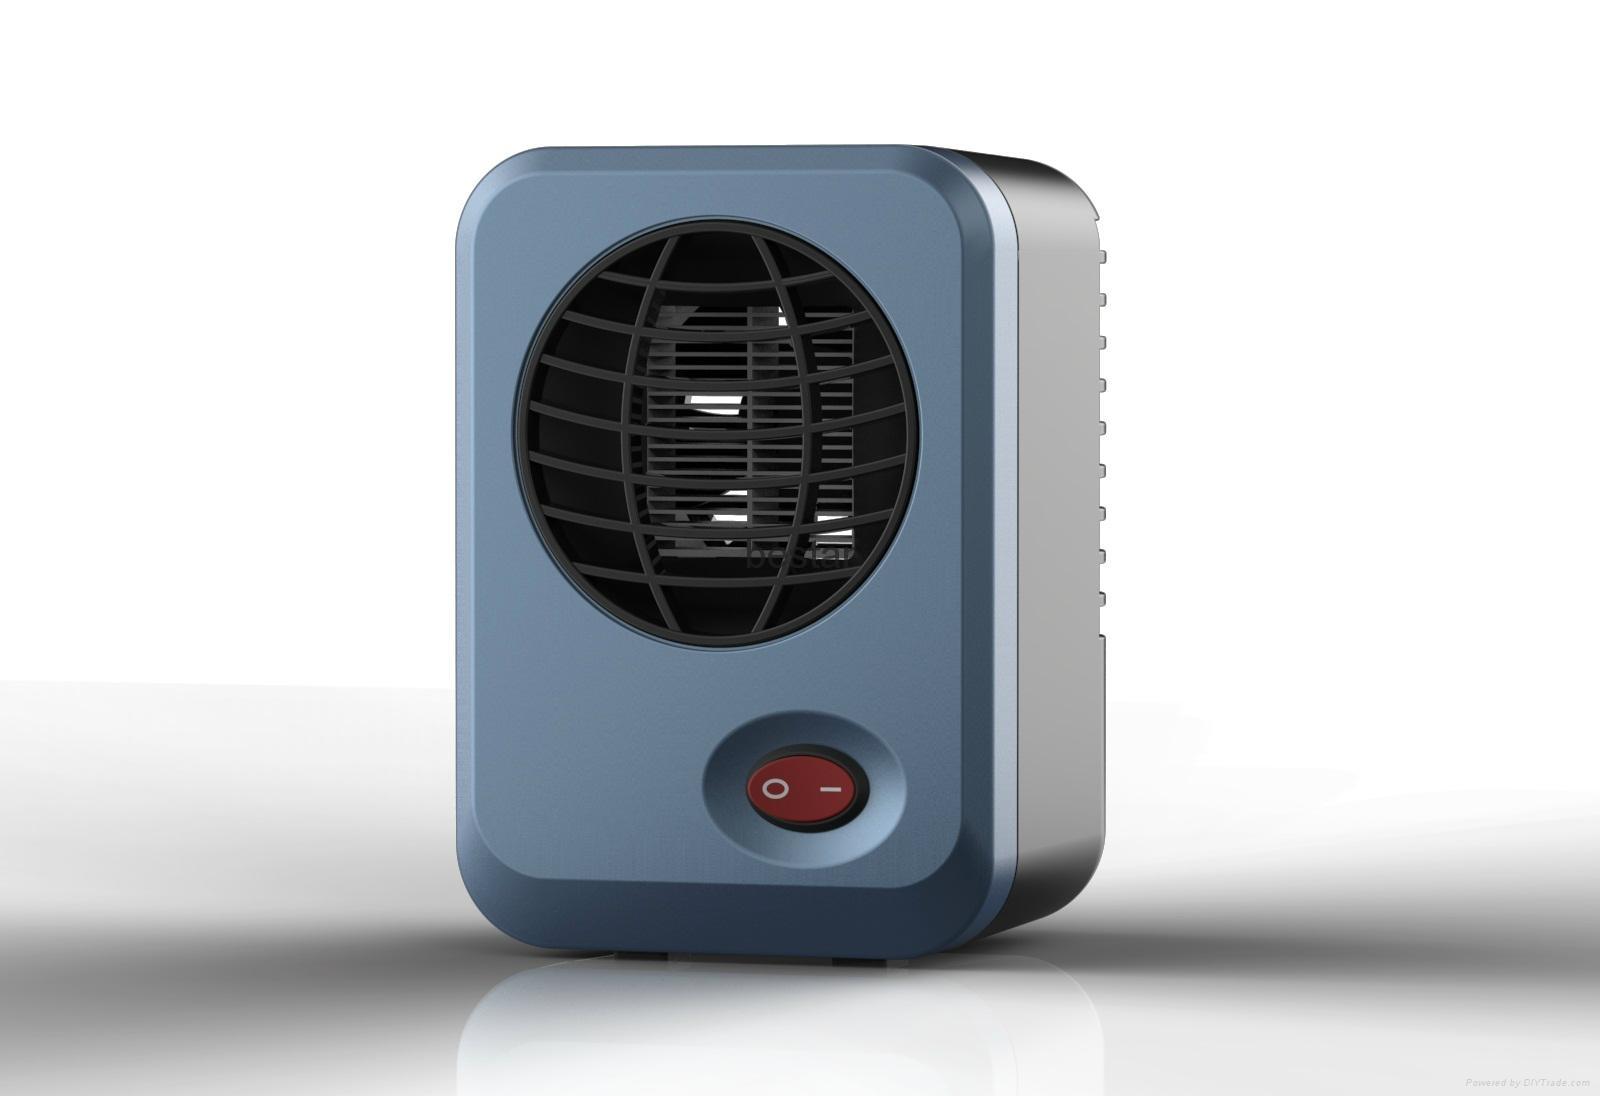 Portable 300W 220V Mini Fan Heater Handheld Electric Heating Device  1